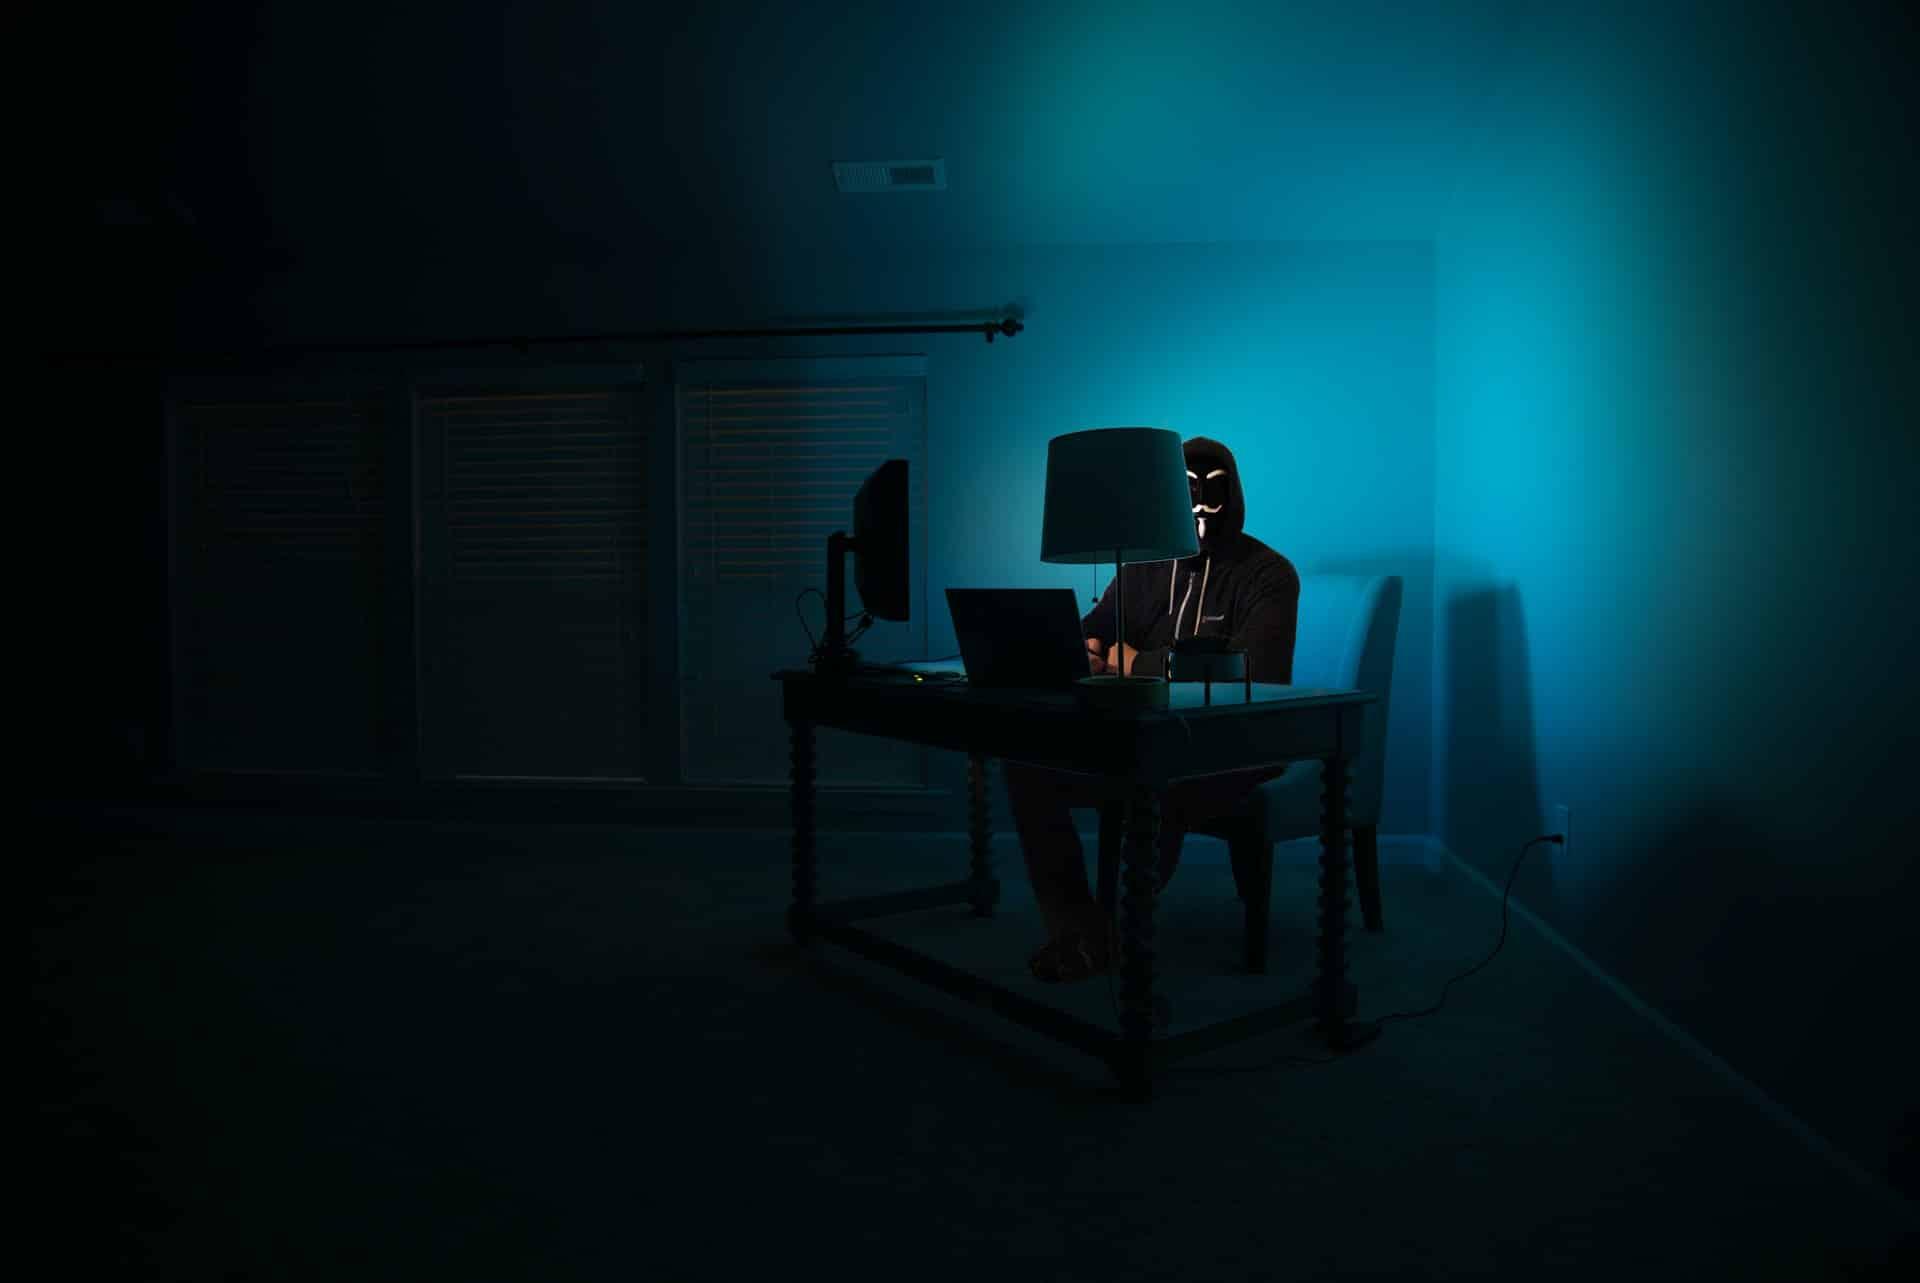 Under Attack Cybersecurity Inquiries Header Image